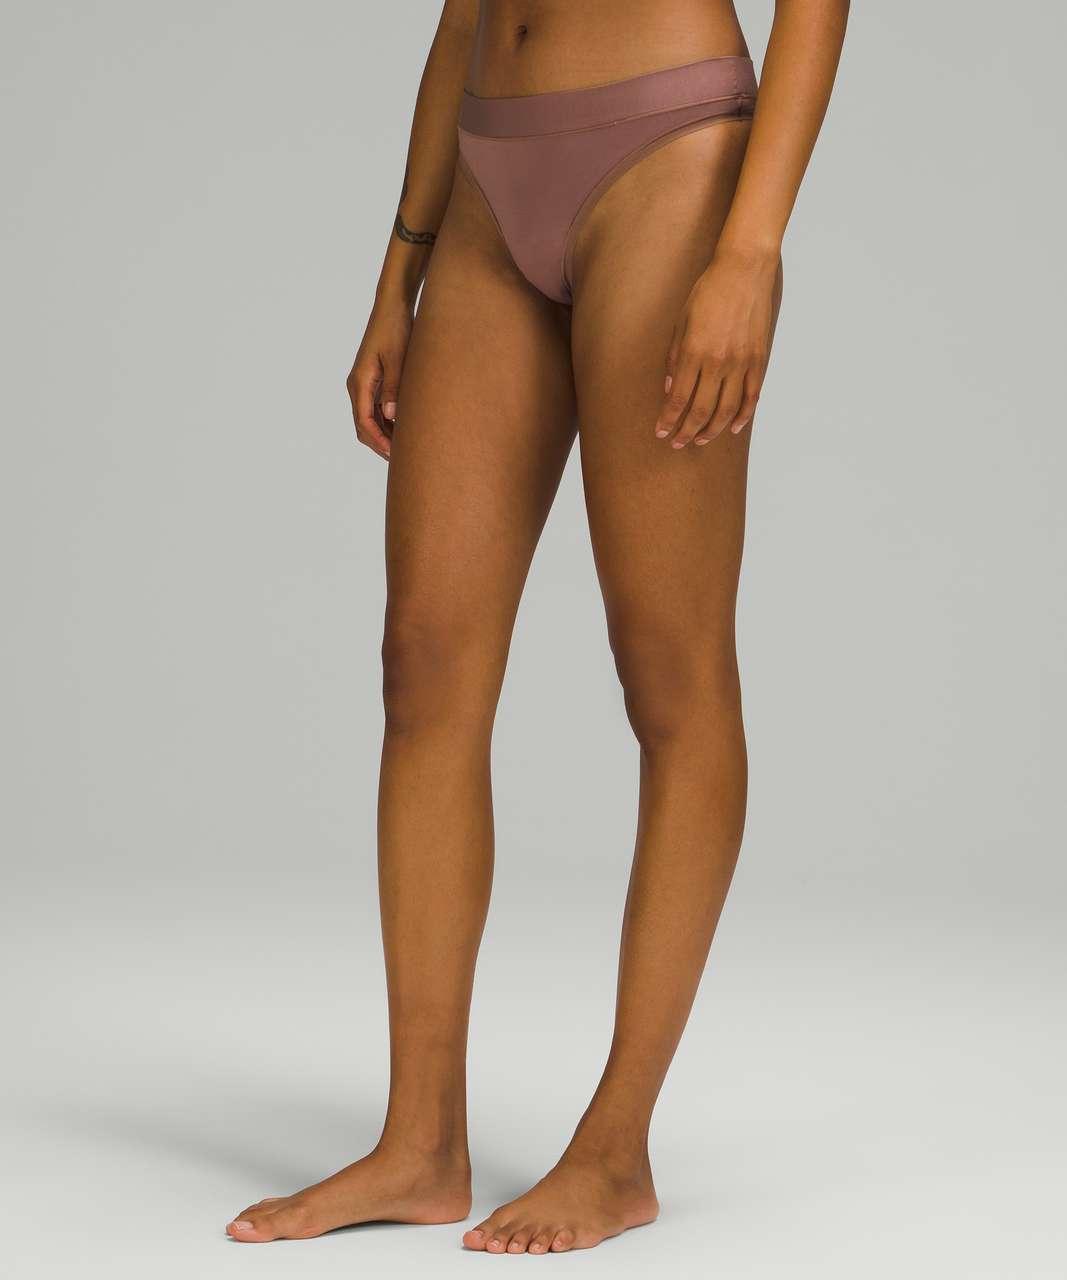 Lululemon UnderEase Mid-Rise Thong Underwear - Dusty Bronze